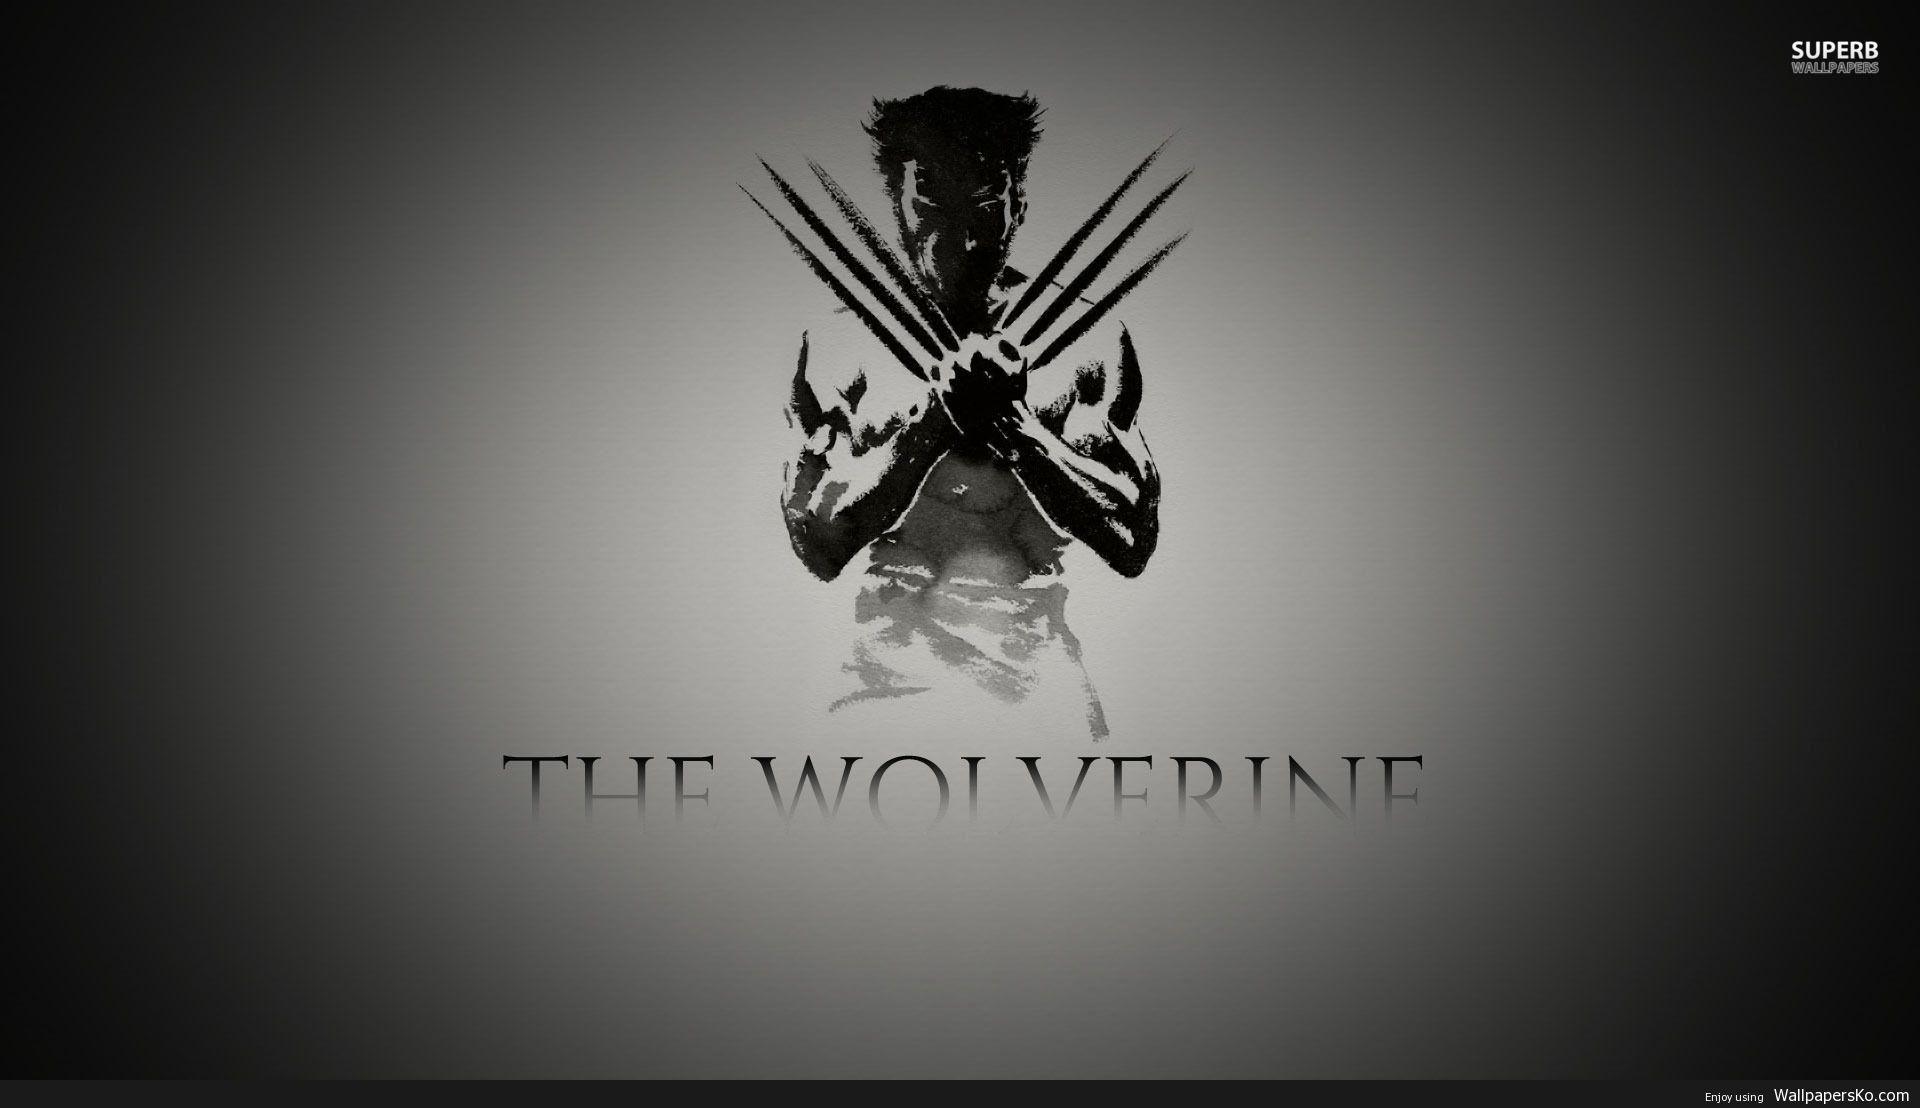 Black Wolverine Wallpaper Http Wallpapersko Com Black Wolverine Wallpaper Html Hd Wallpapers Download Hd Wallpapers For Pc Wolverine Wallpaper Pc